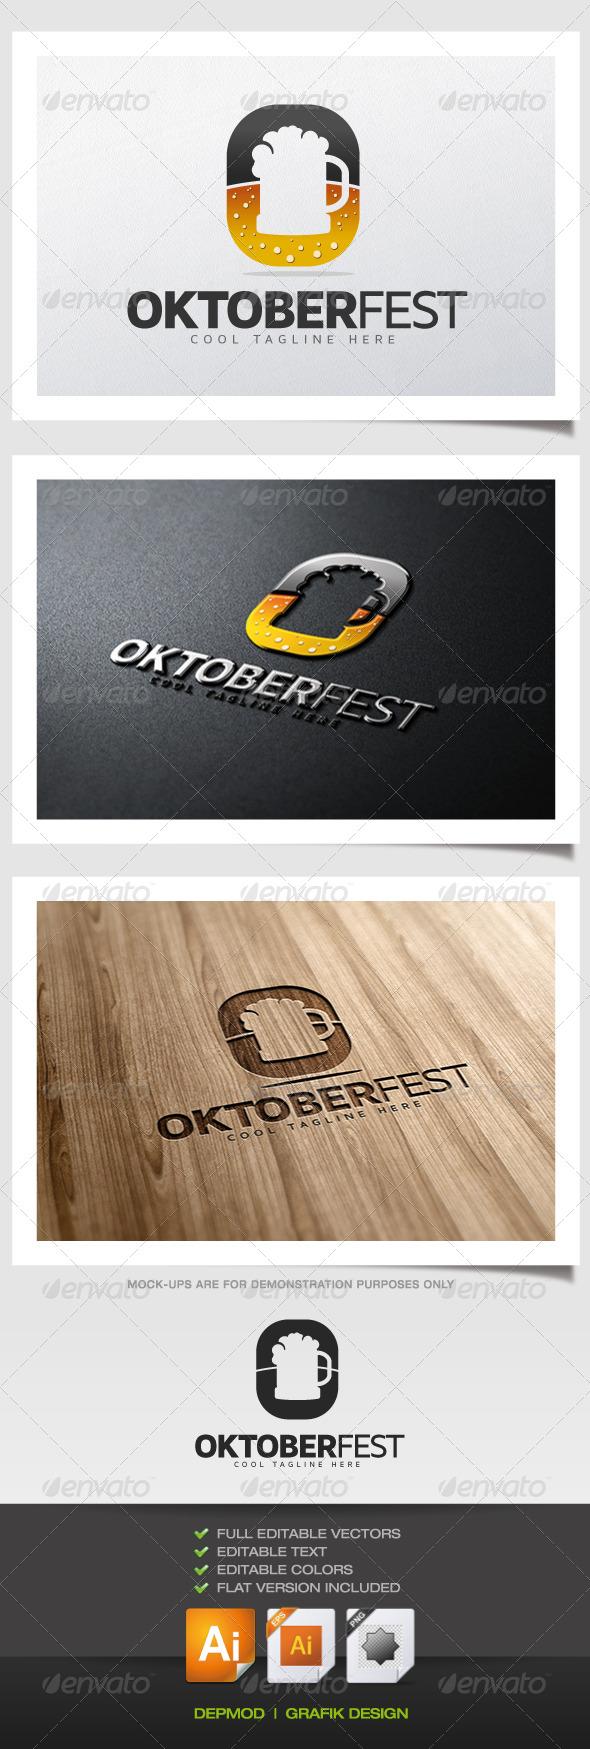 GraphicRiver Oktoberfest Logo 5483959